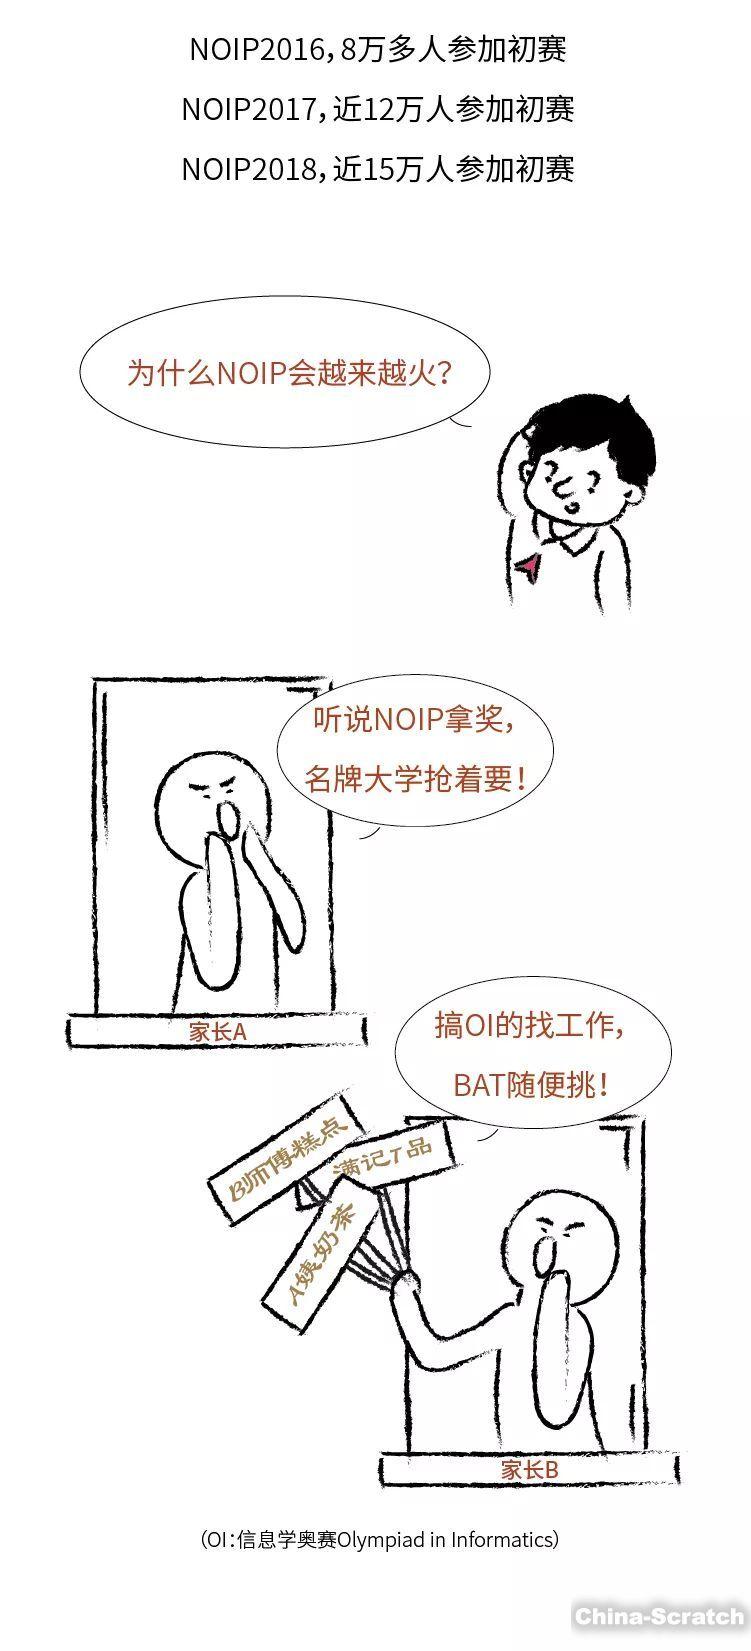 http://www.china-scratch.com/Uploads/timg/190520/1K52040A-3.jpg